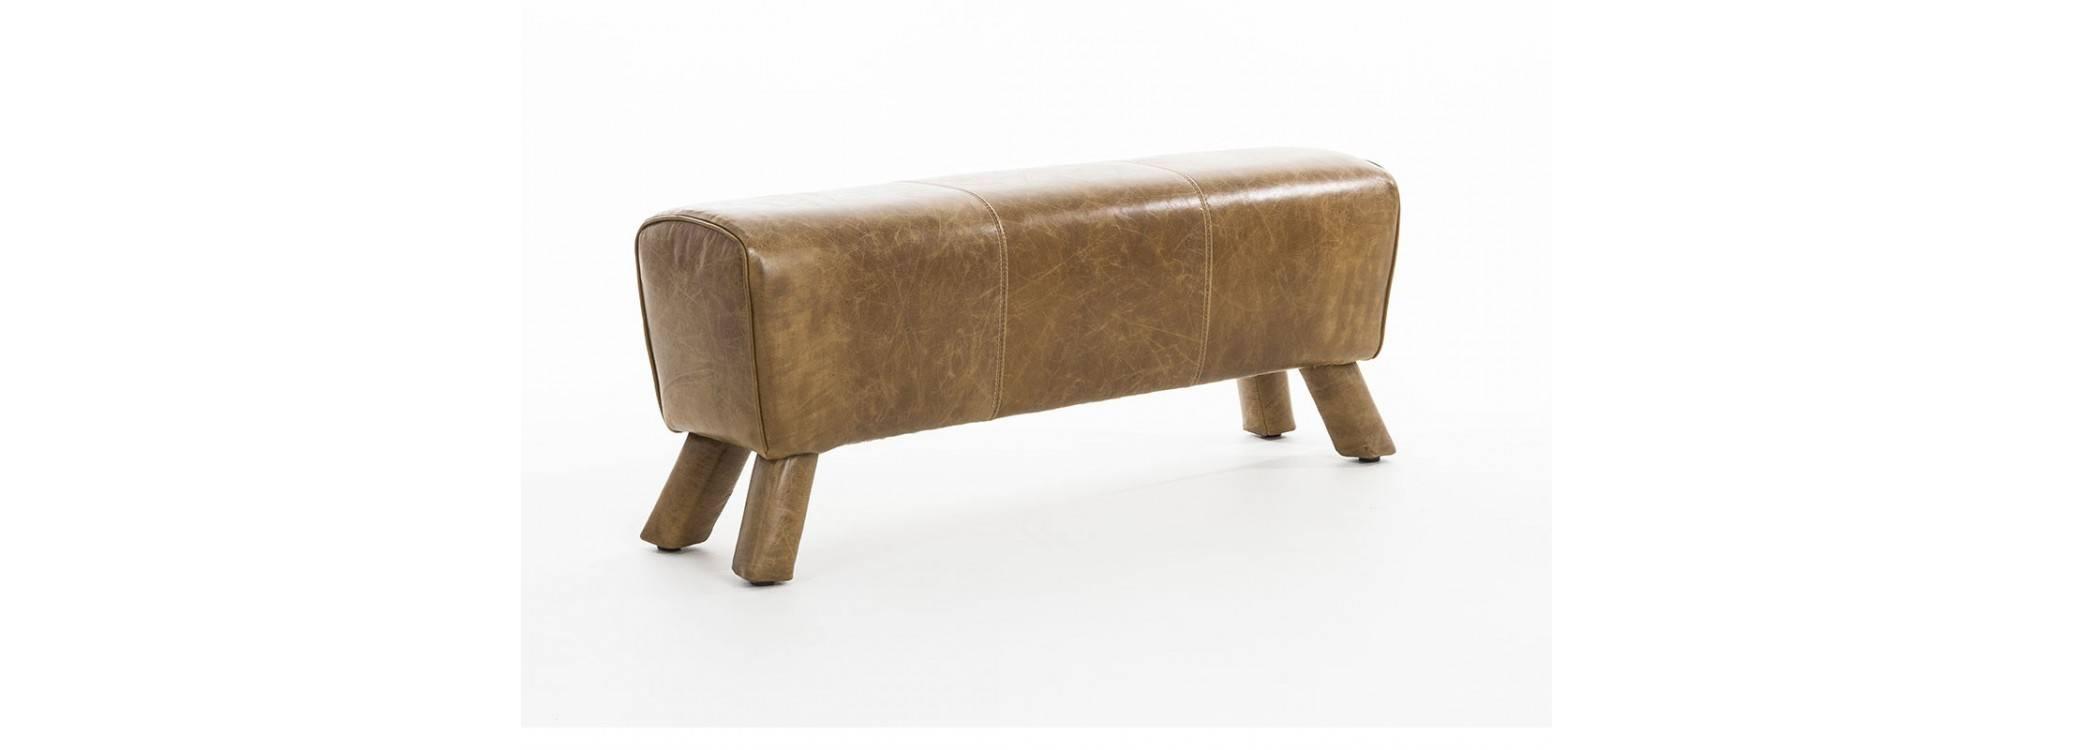 Banc cheval d'arçon - Cuir Colombia brown